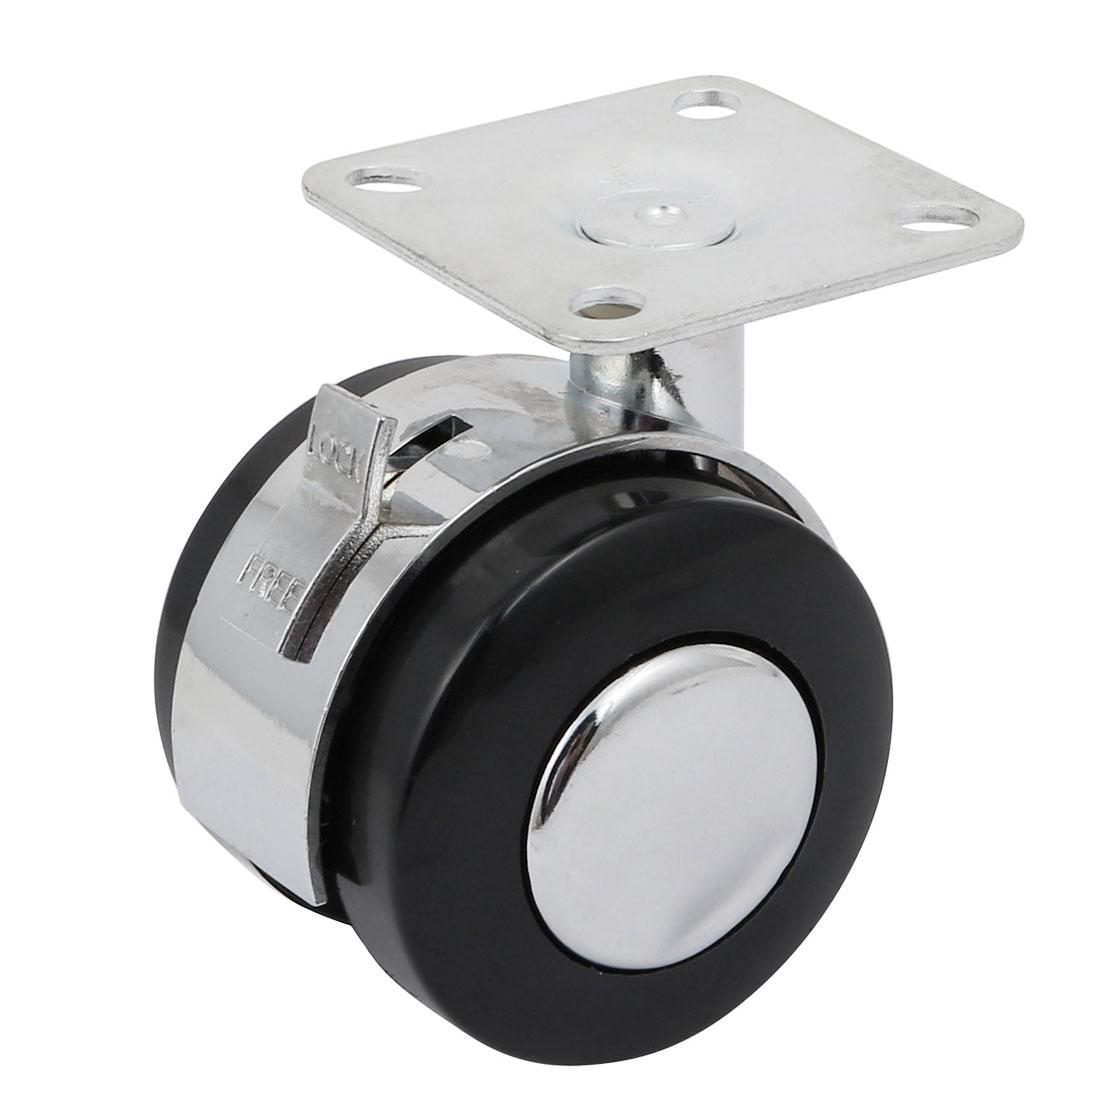 2-inch Diameter Double Wheel Swiveling Top Plate Brake Caster Roller - image 2 de 2